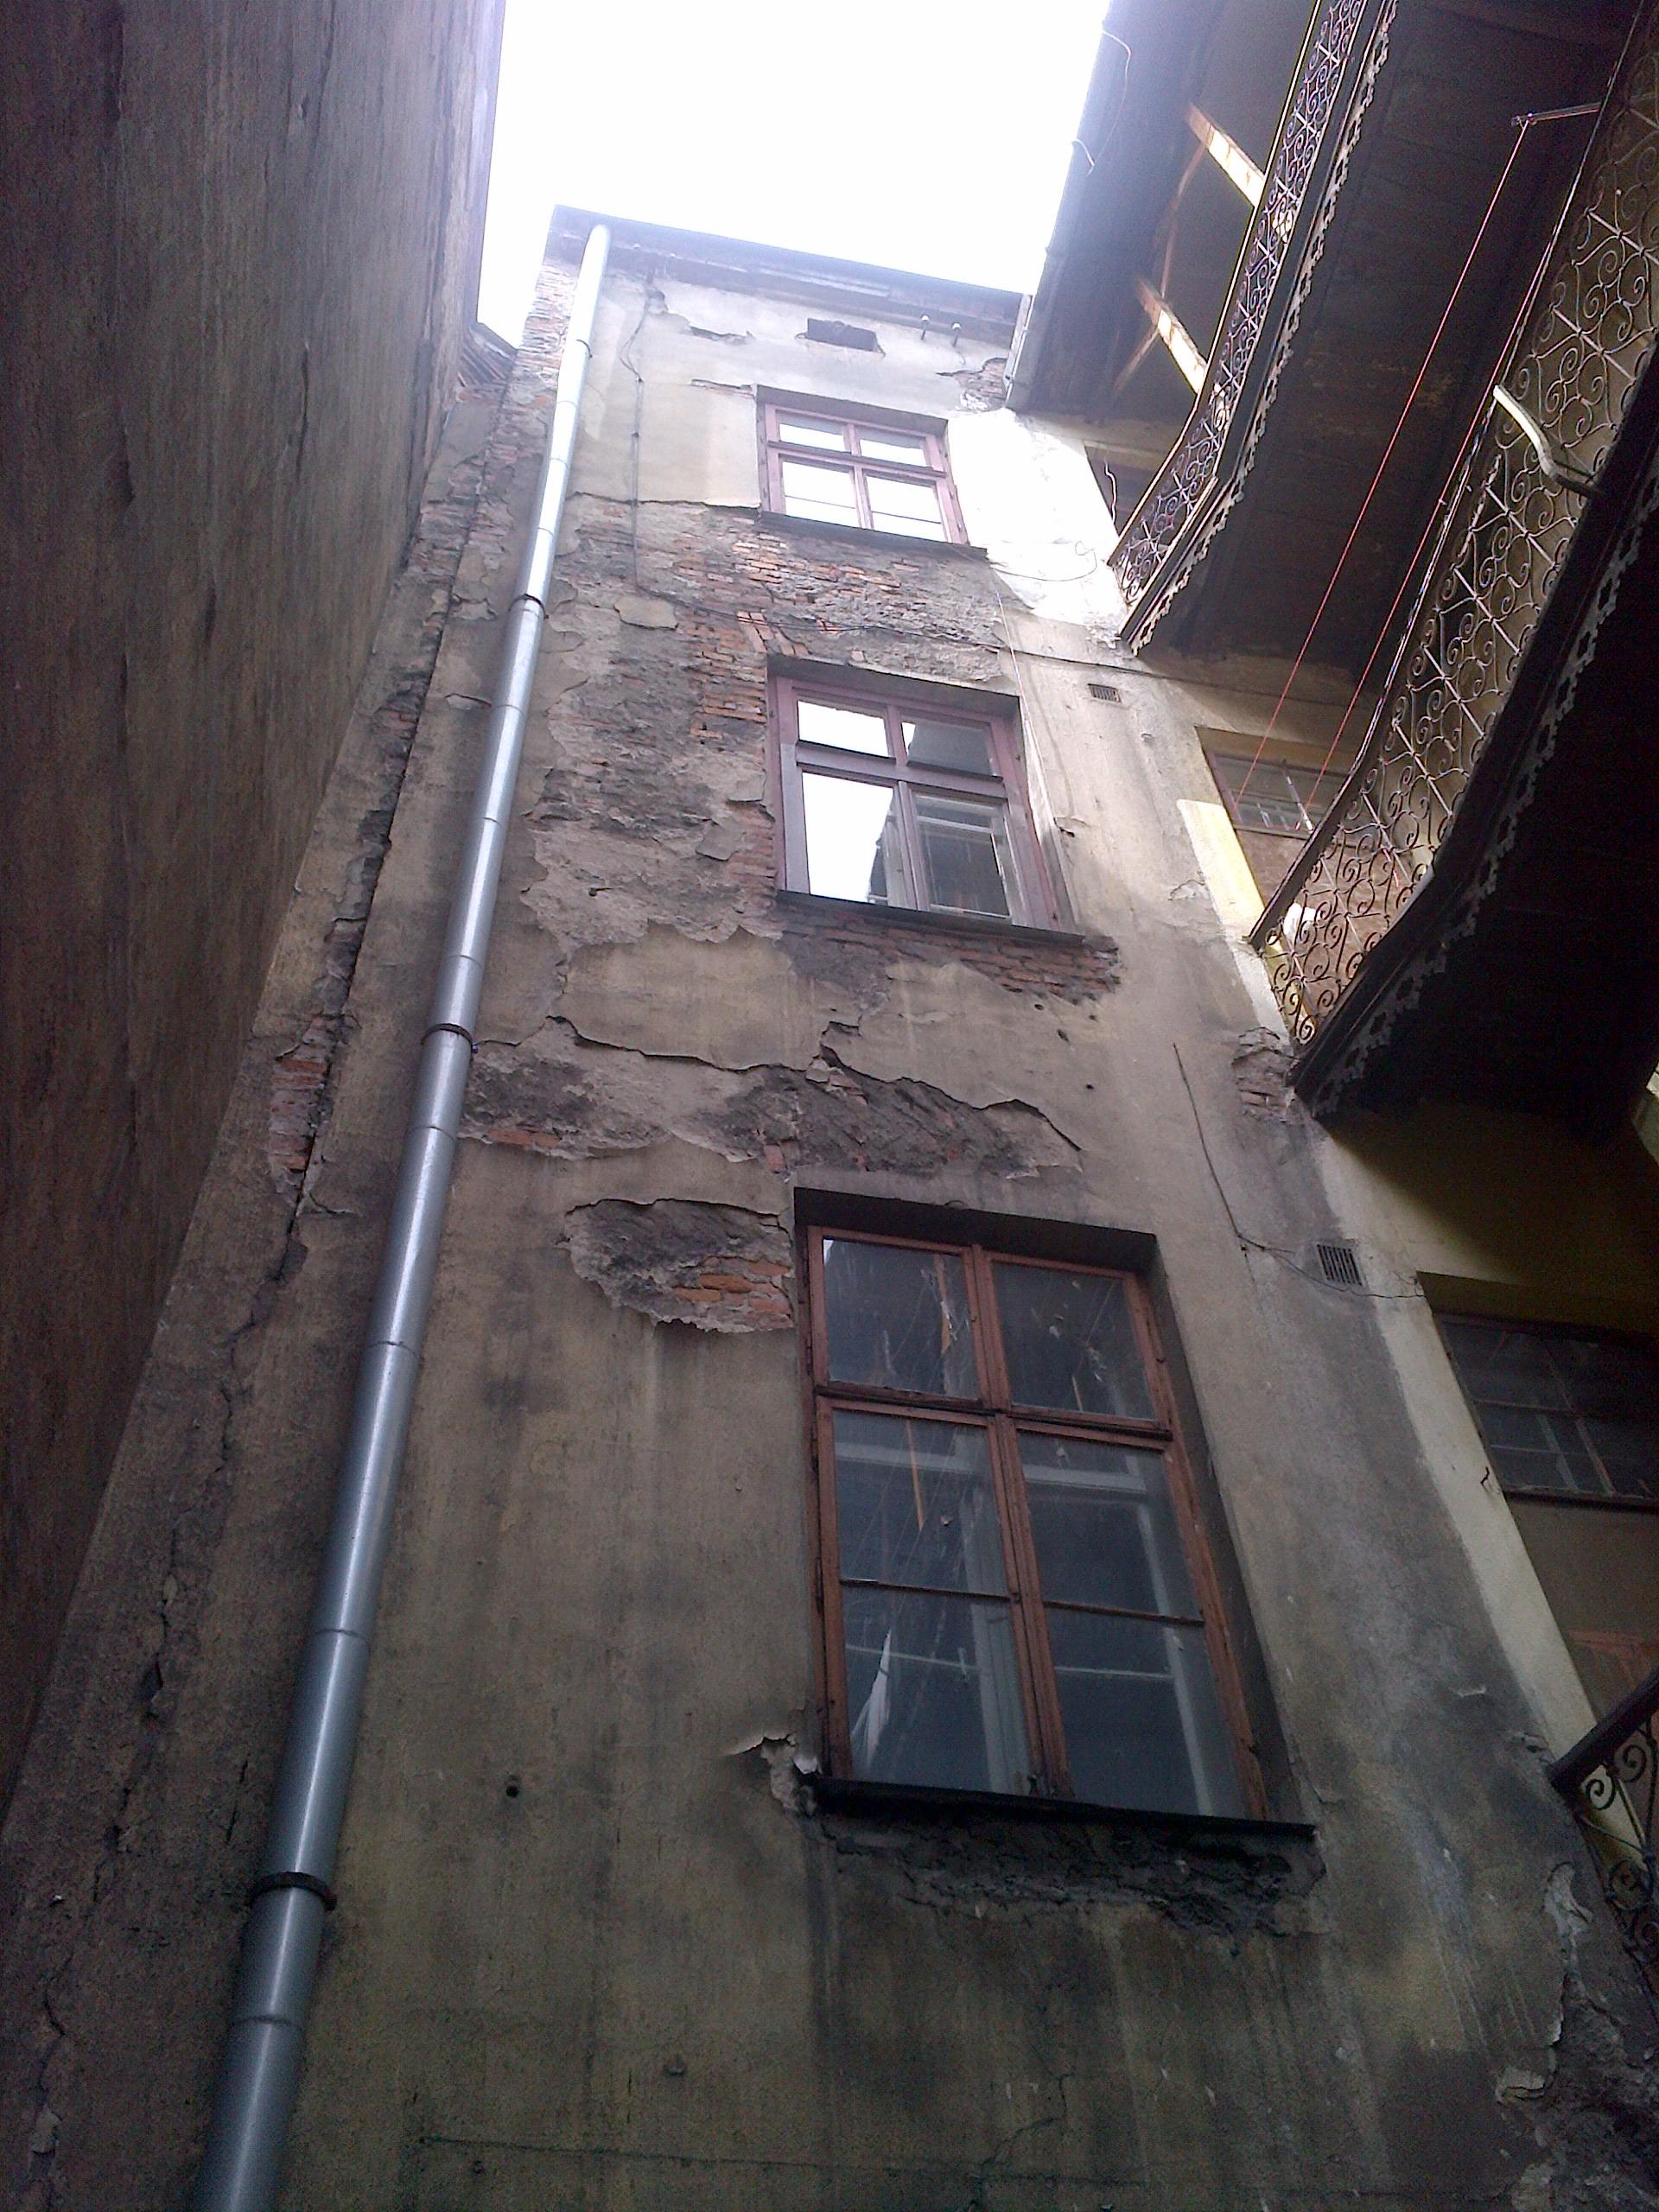 Hotel Indigo Kraków-Old Town